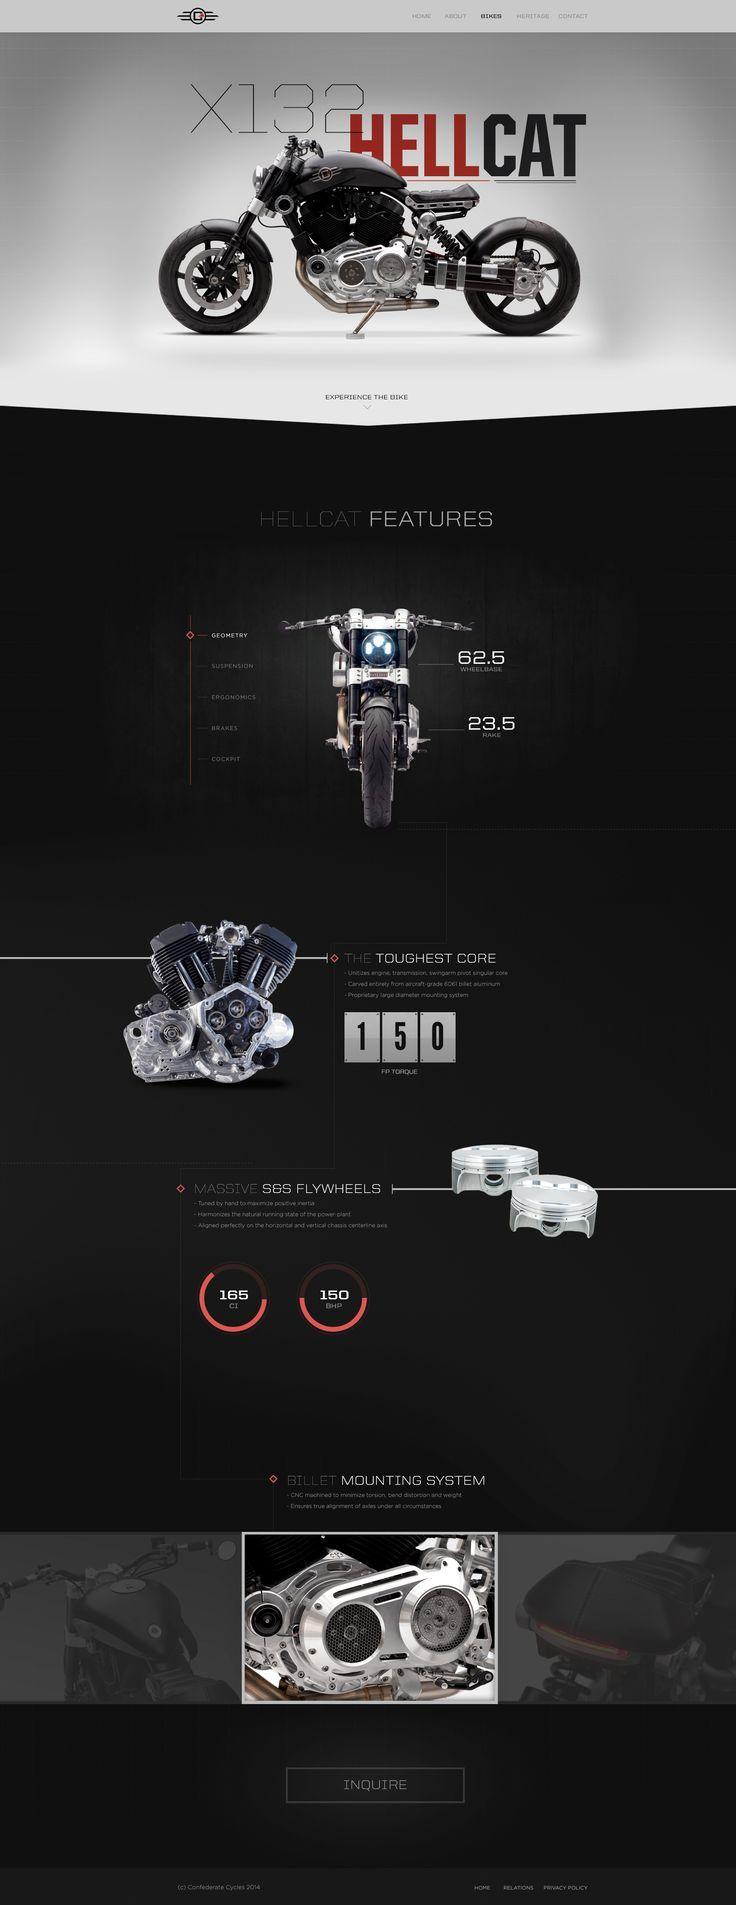 Infographics Ui Design Et Web Design: Pin On Design